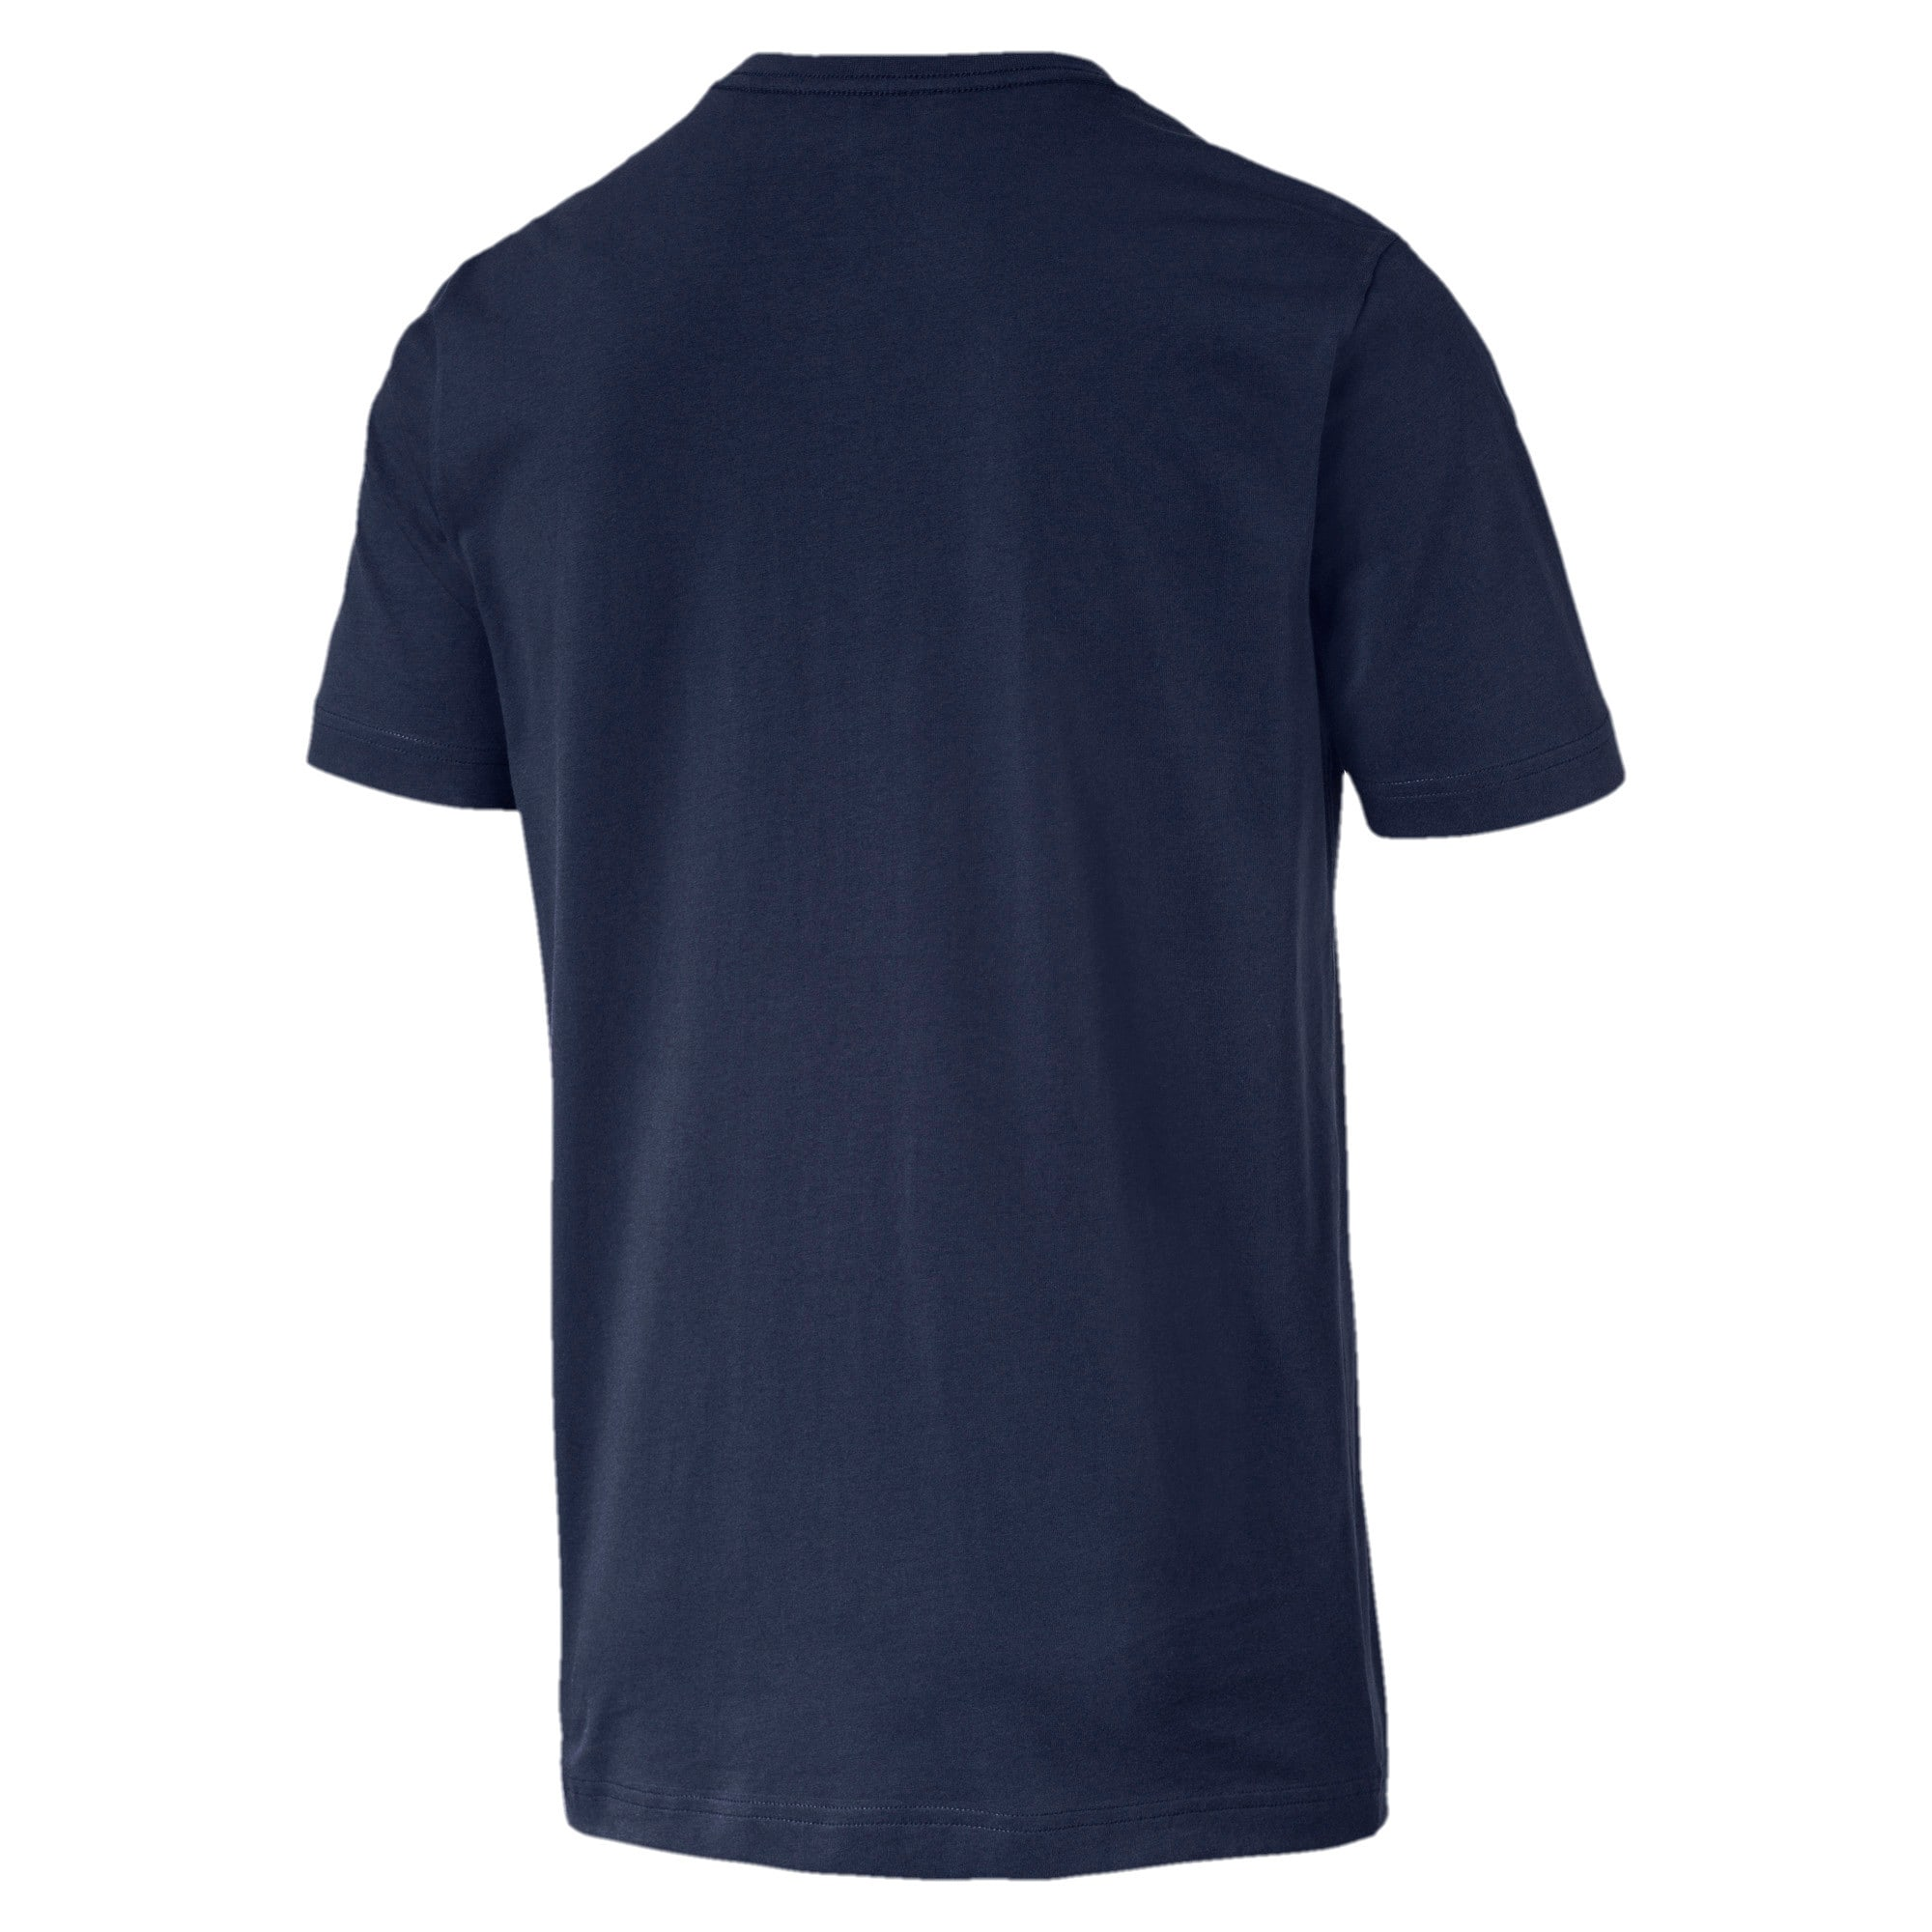 Thumbnail 5 of T-shirt a maniche corte Essentials uomo, Peacoat, medium